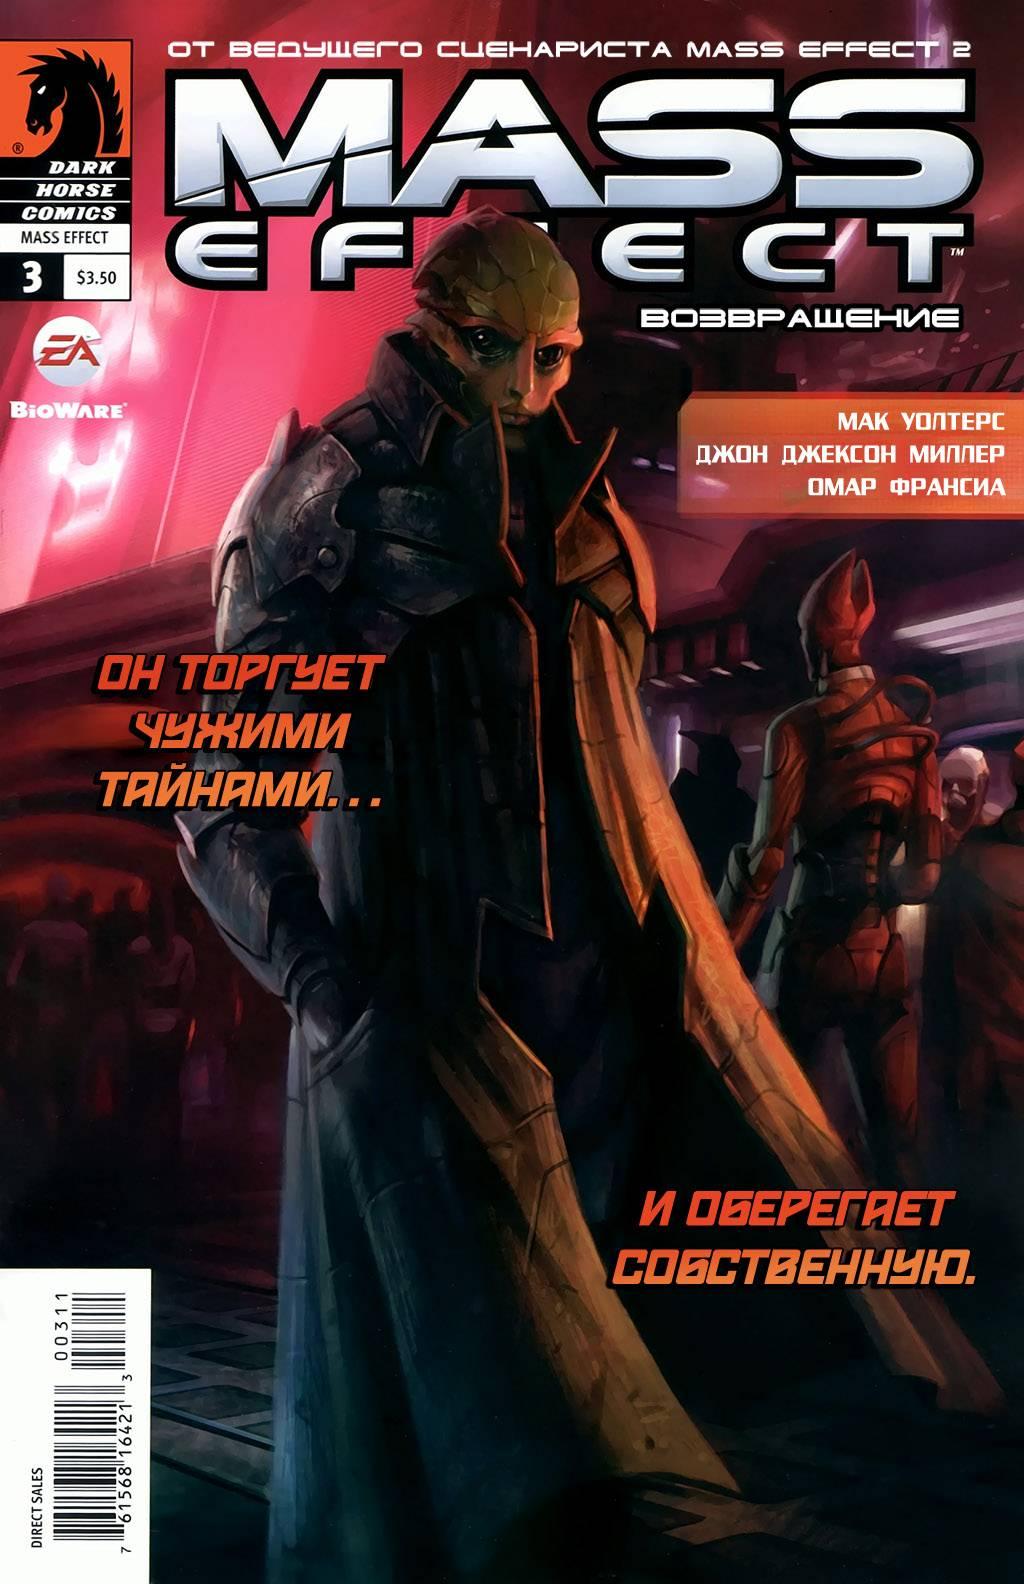 Mass Effect: Искупление №3 онлайн